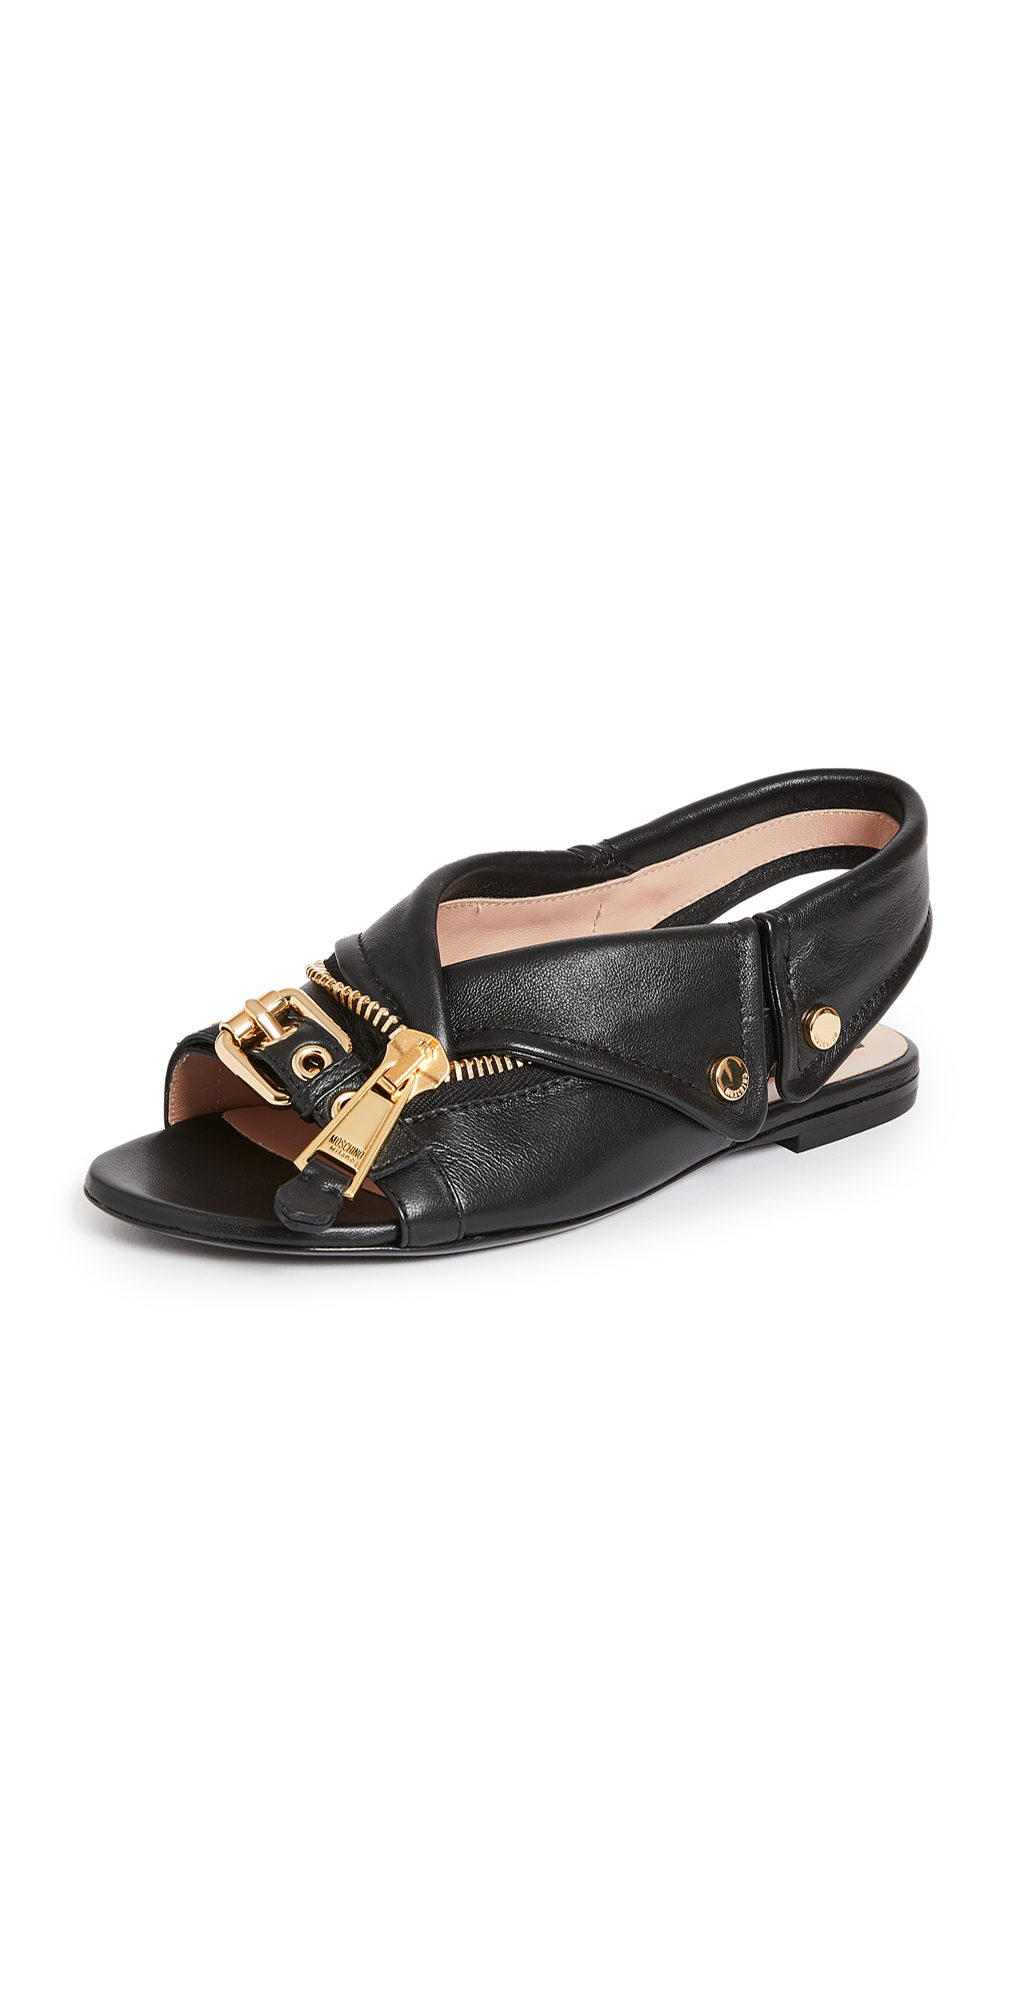 Moschino Slingback Flat Sandals